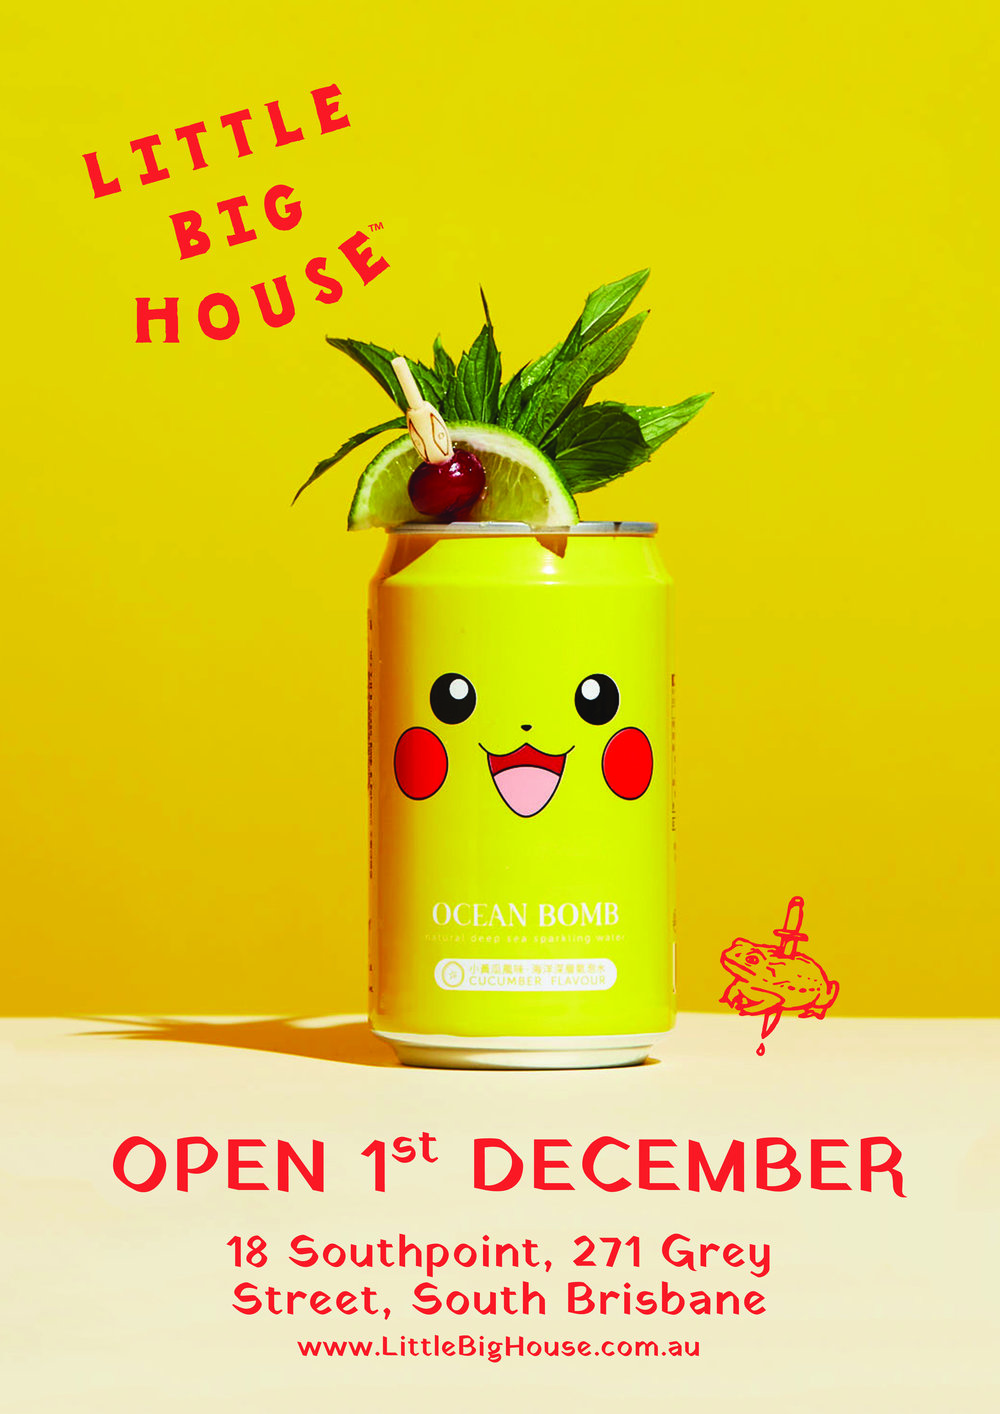 LBH_Pikachu-01.jpg